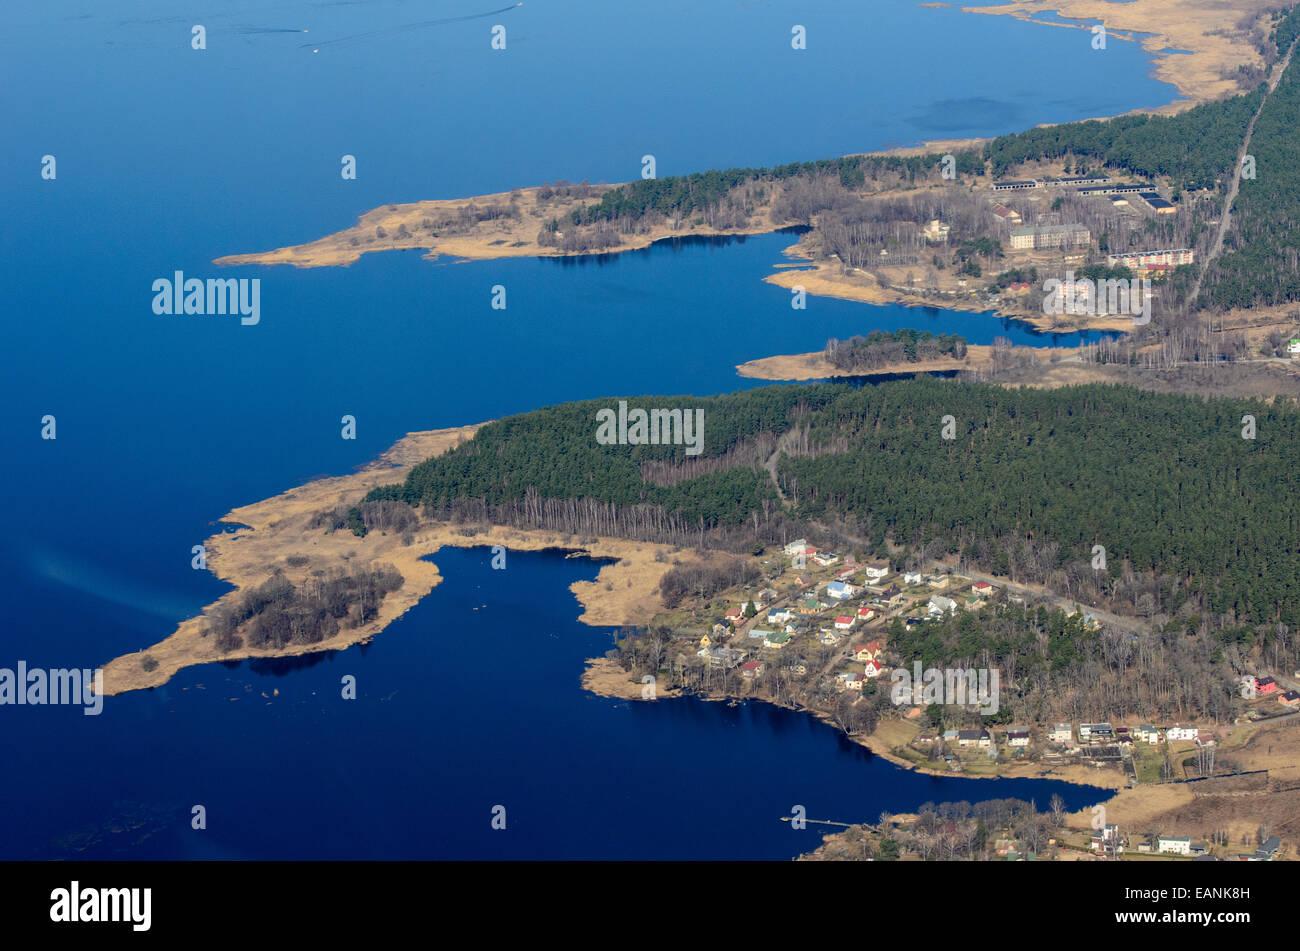 Jagged oast of Lake Kisezers, Latvia - Stock Image